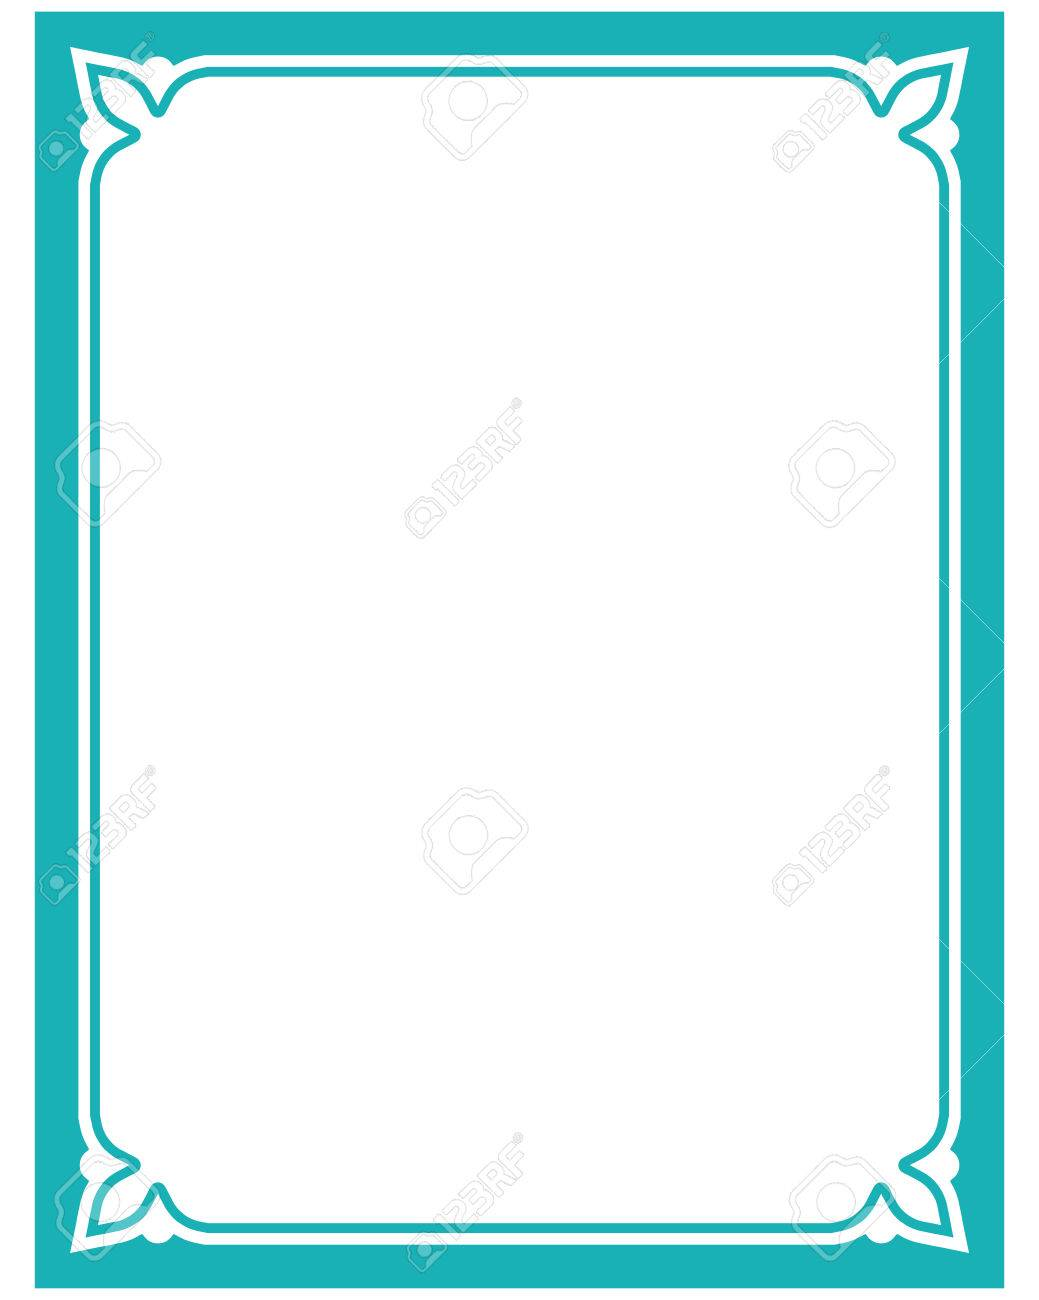 1039x1300 Blue Turquoise Border Frame Deco Vector Label Simple Line Corner